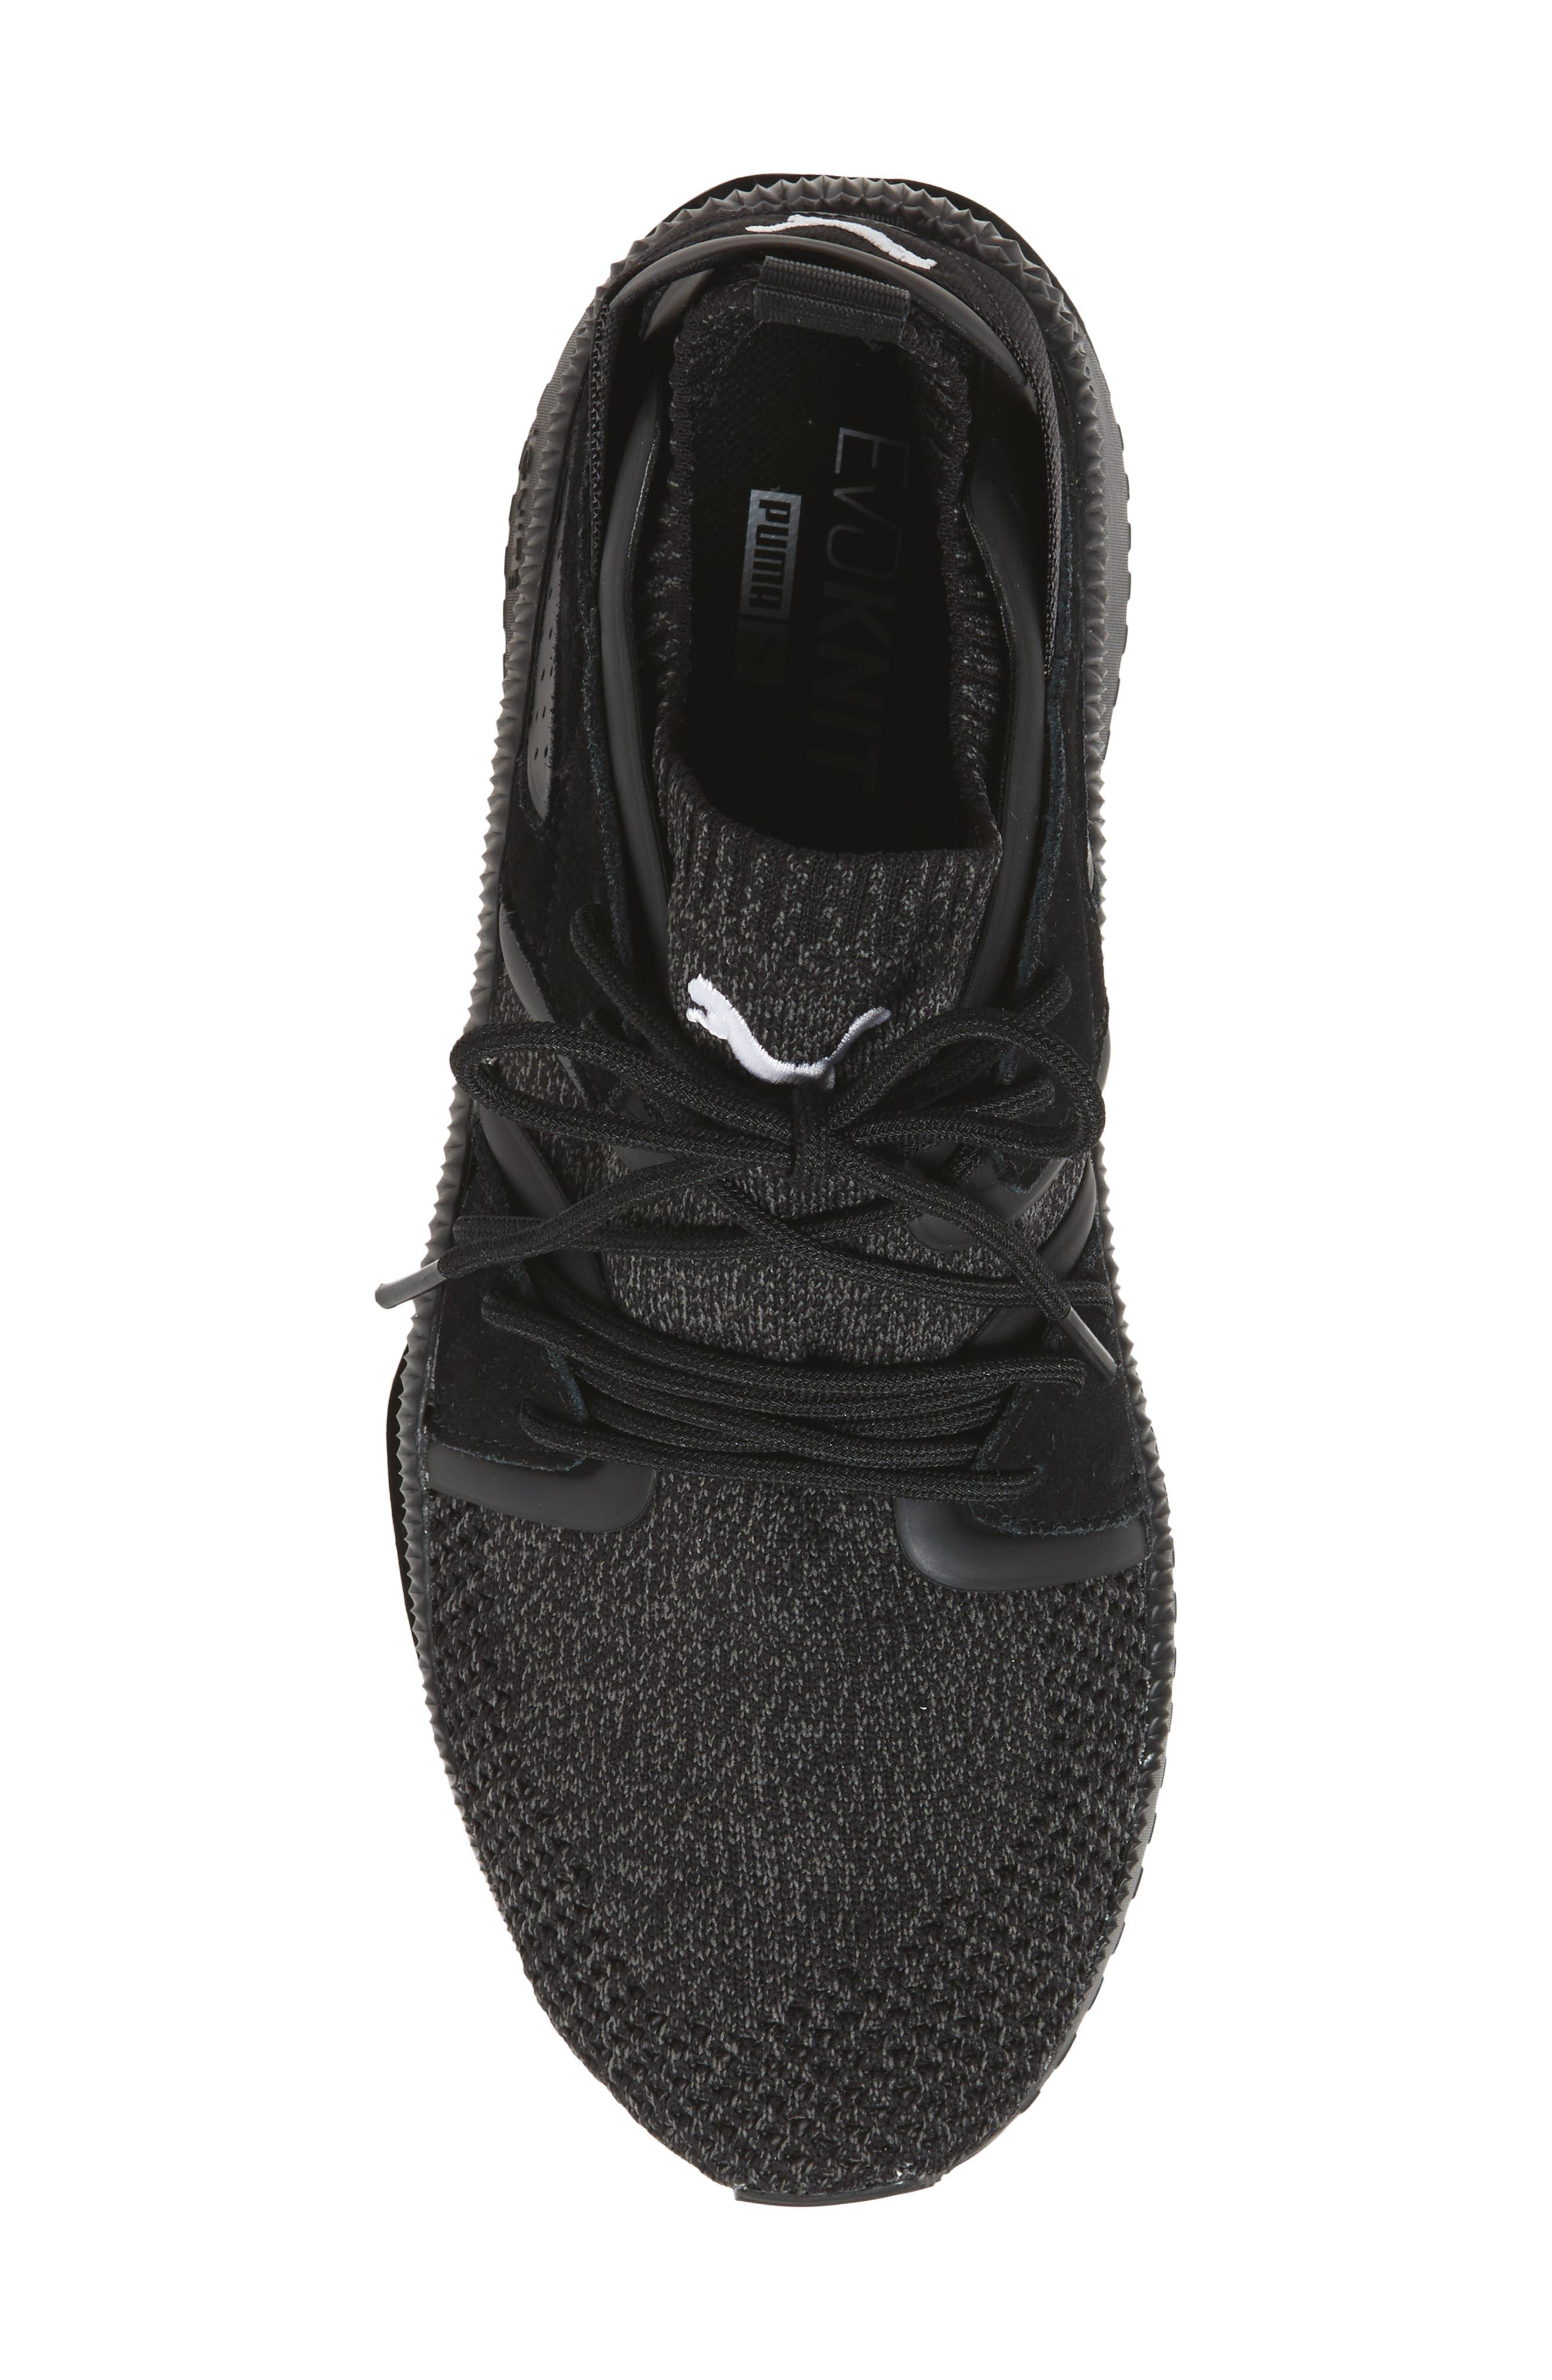 Tsugi Blaze EvoKnit Sneaker,                             Alternate thumbnail 5, color,                             001